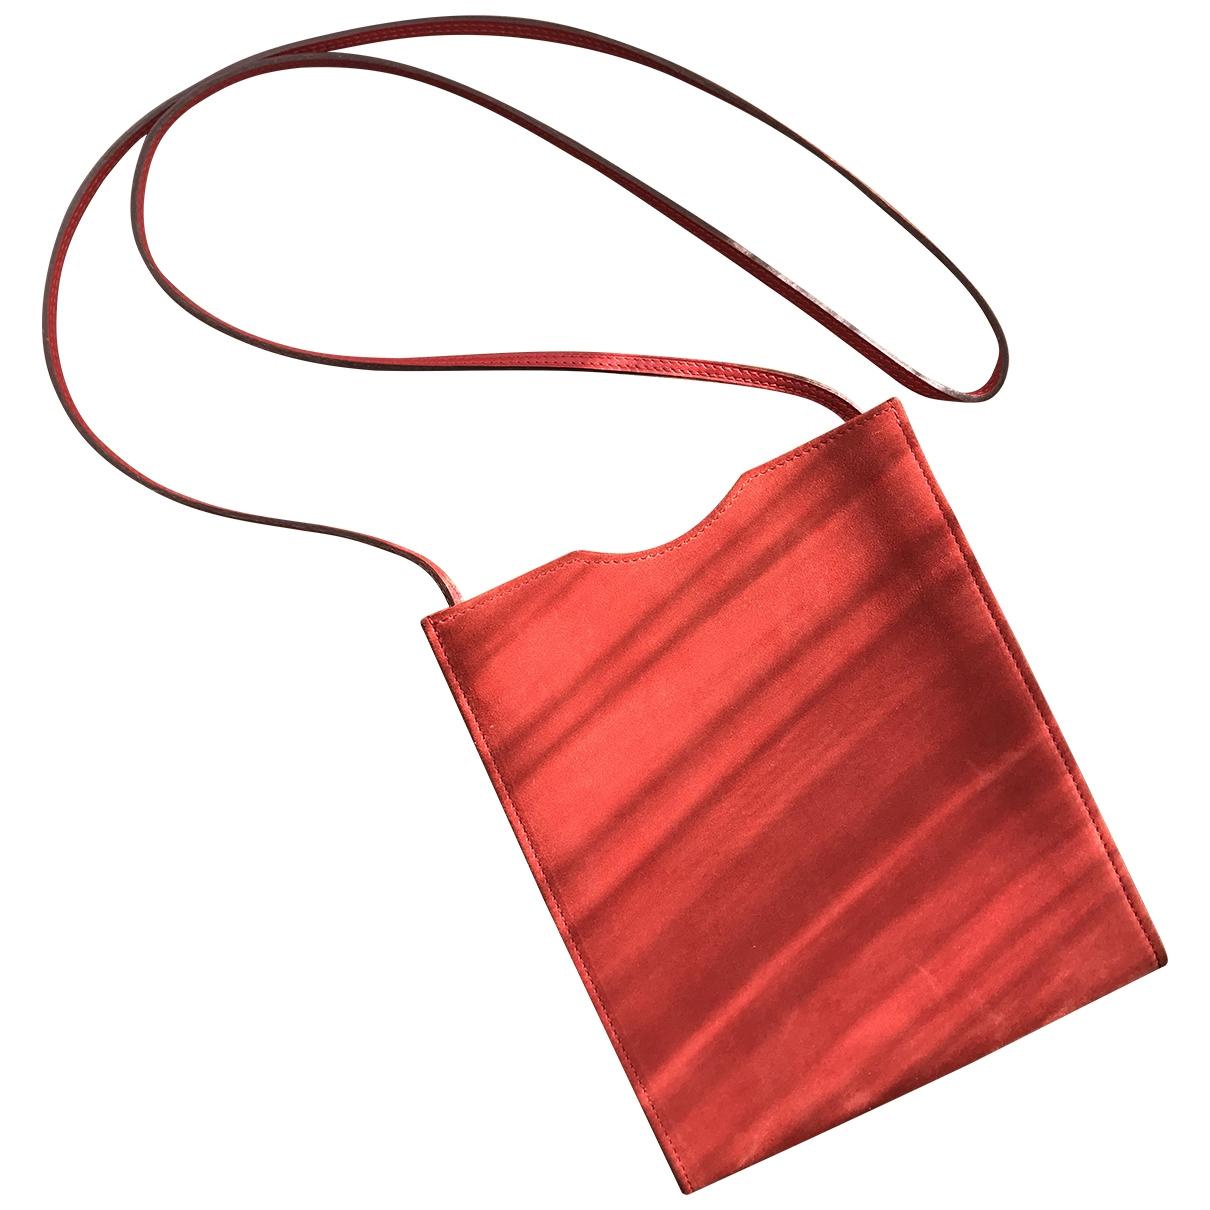 Hermès \N Red Suede Clutch bag for Women \N